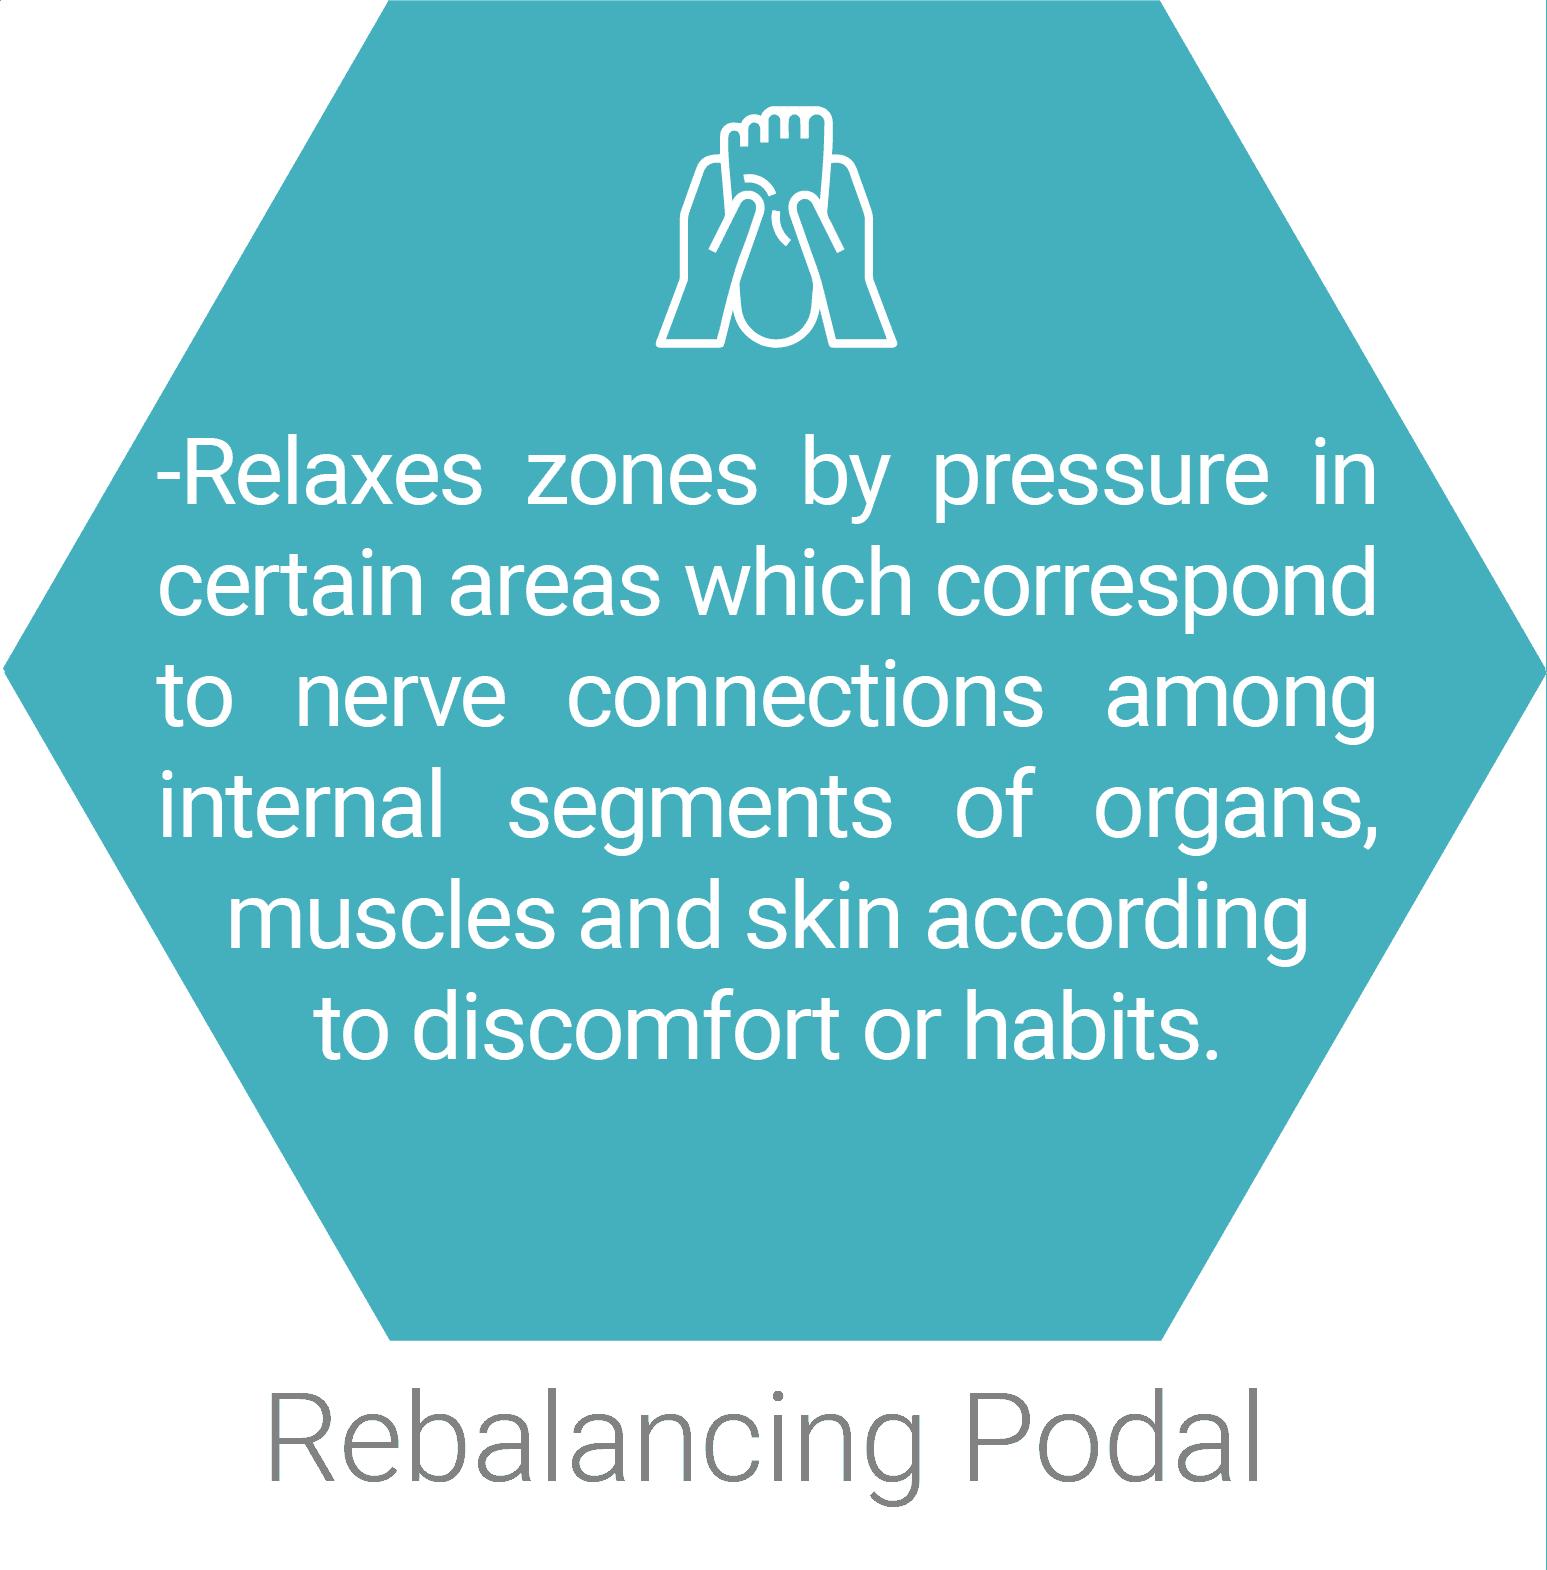 Rebalancing Podal_1